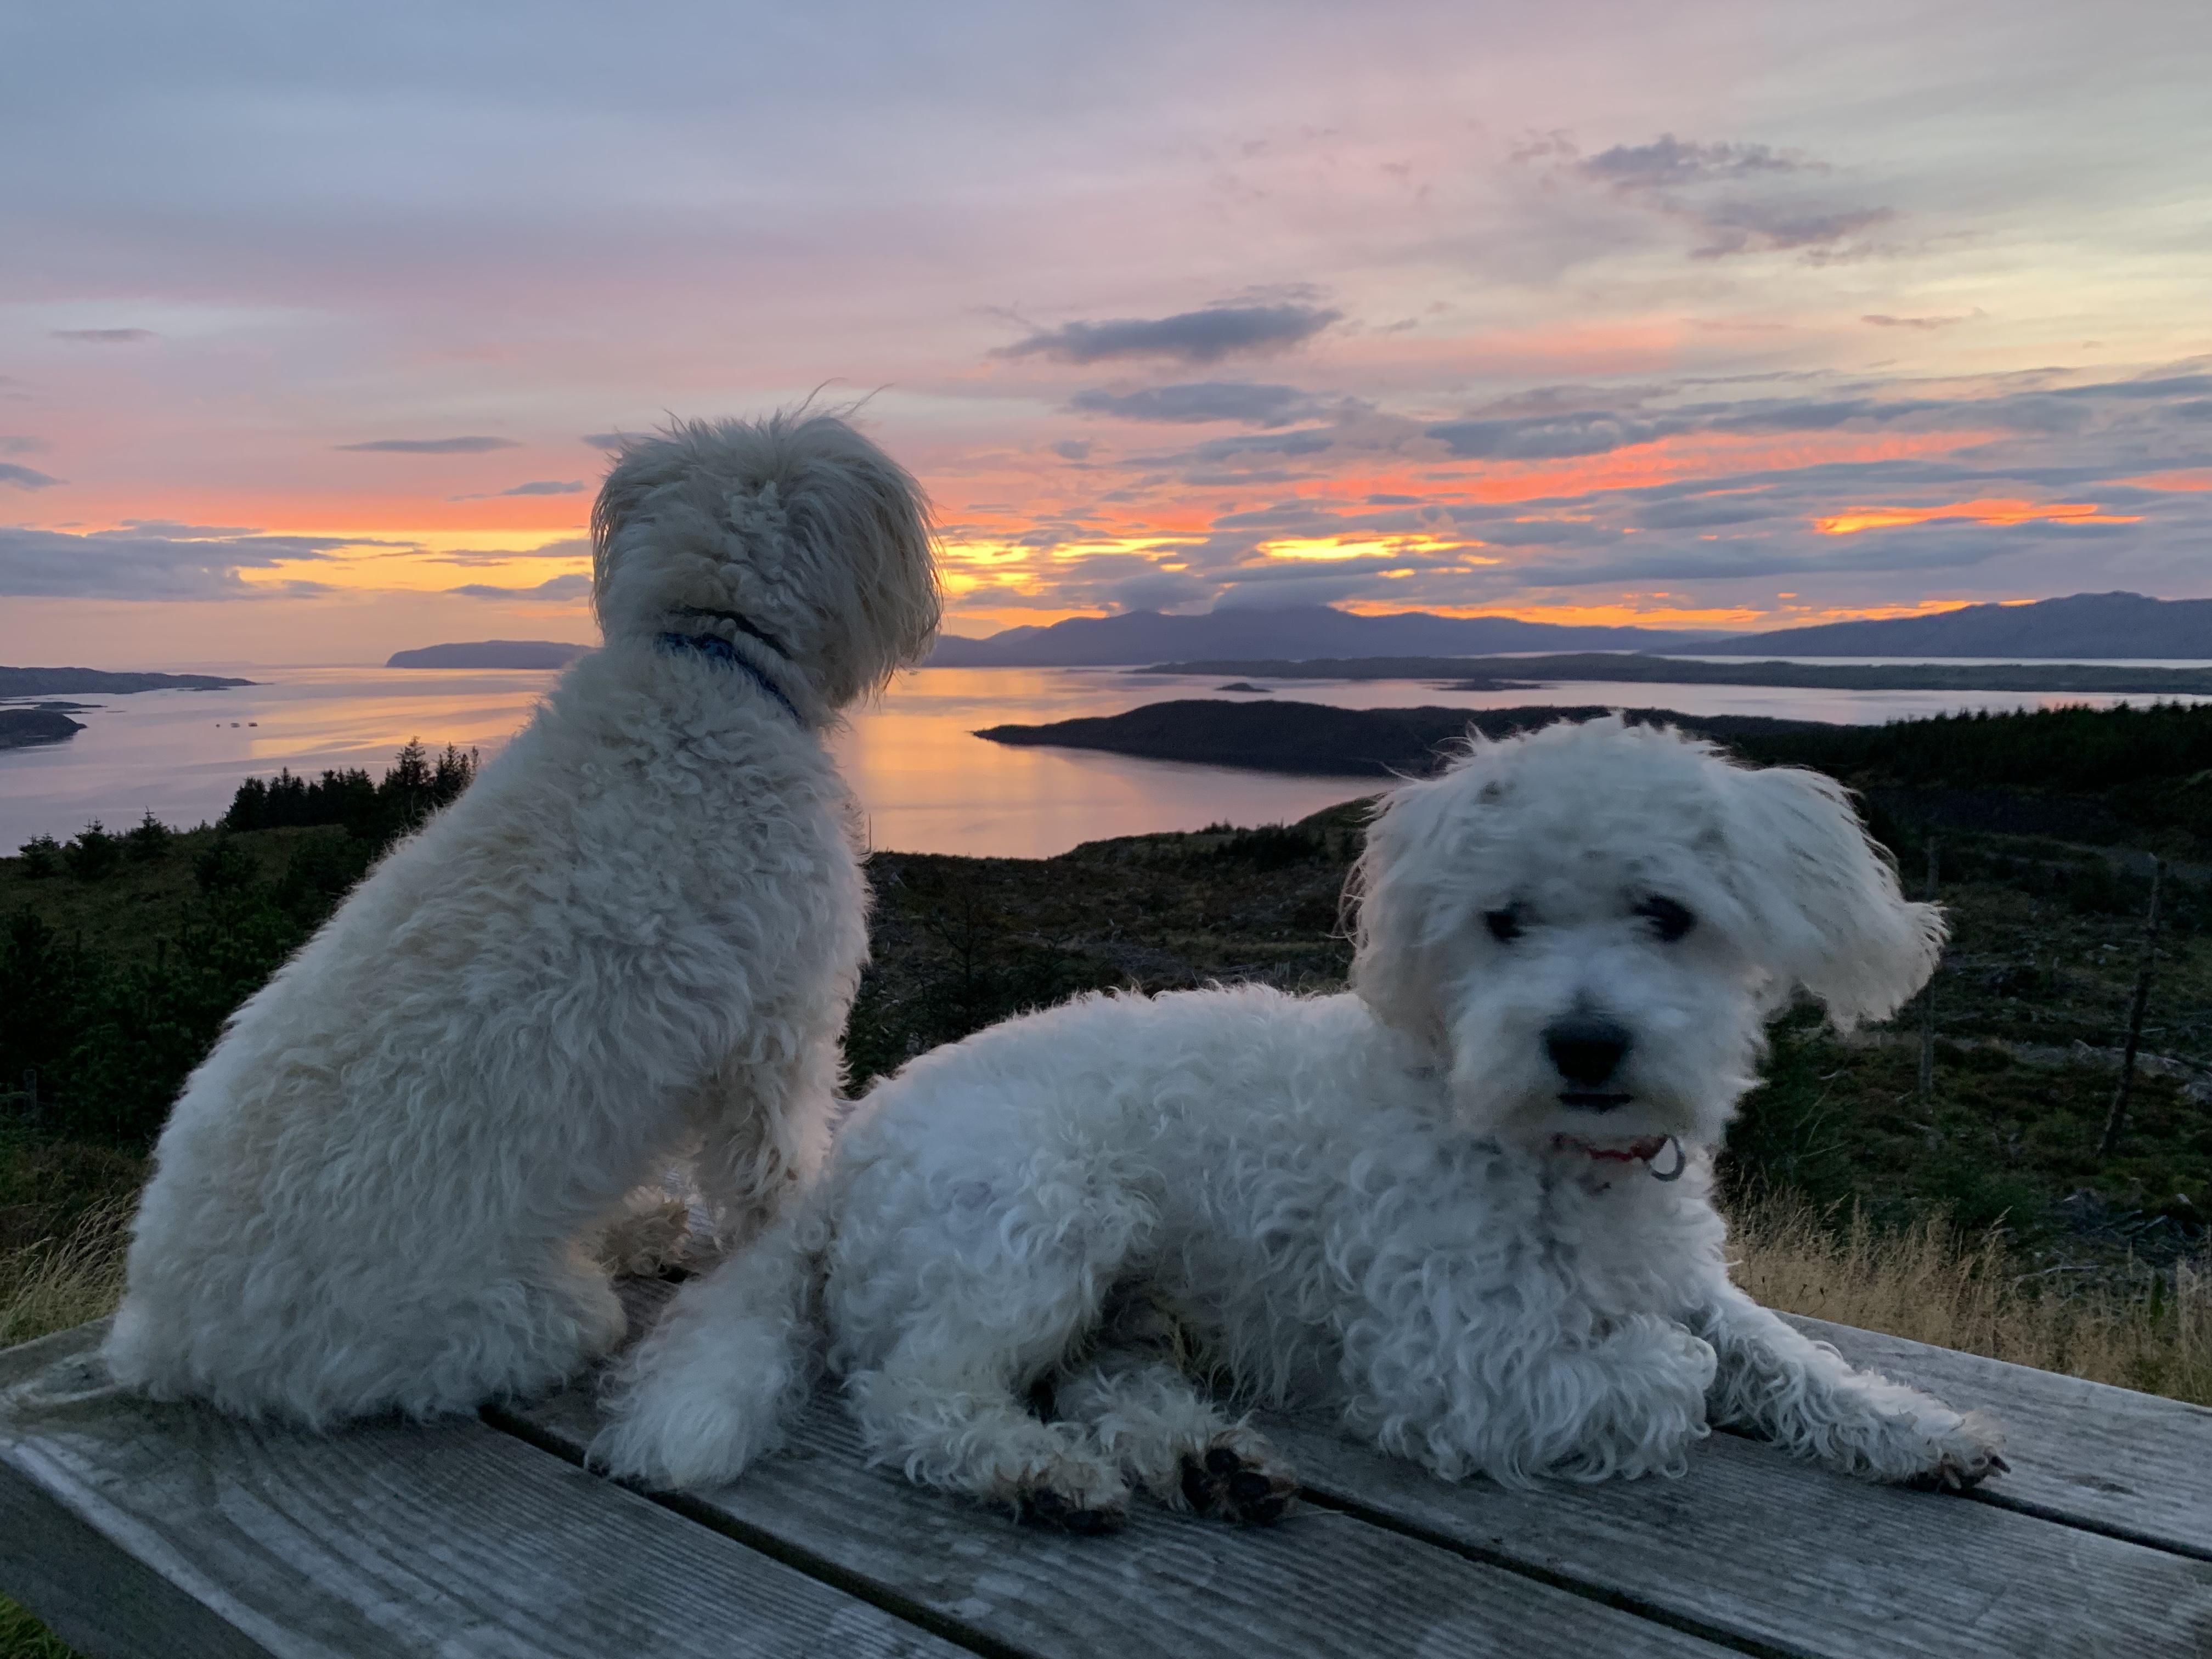 Sunset over Loch Etive